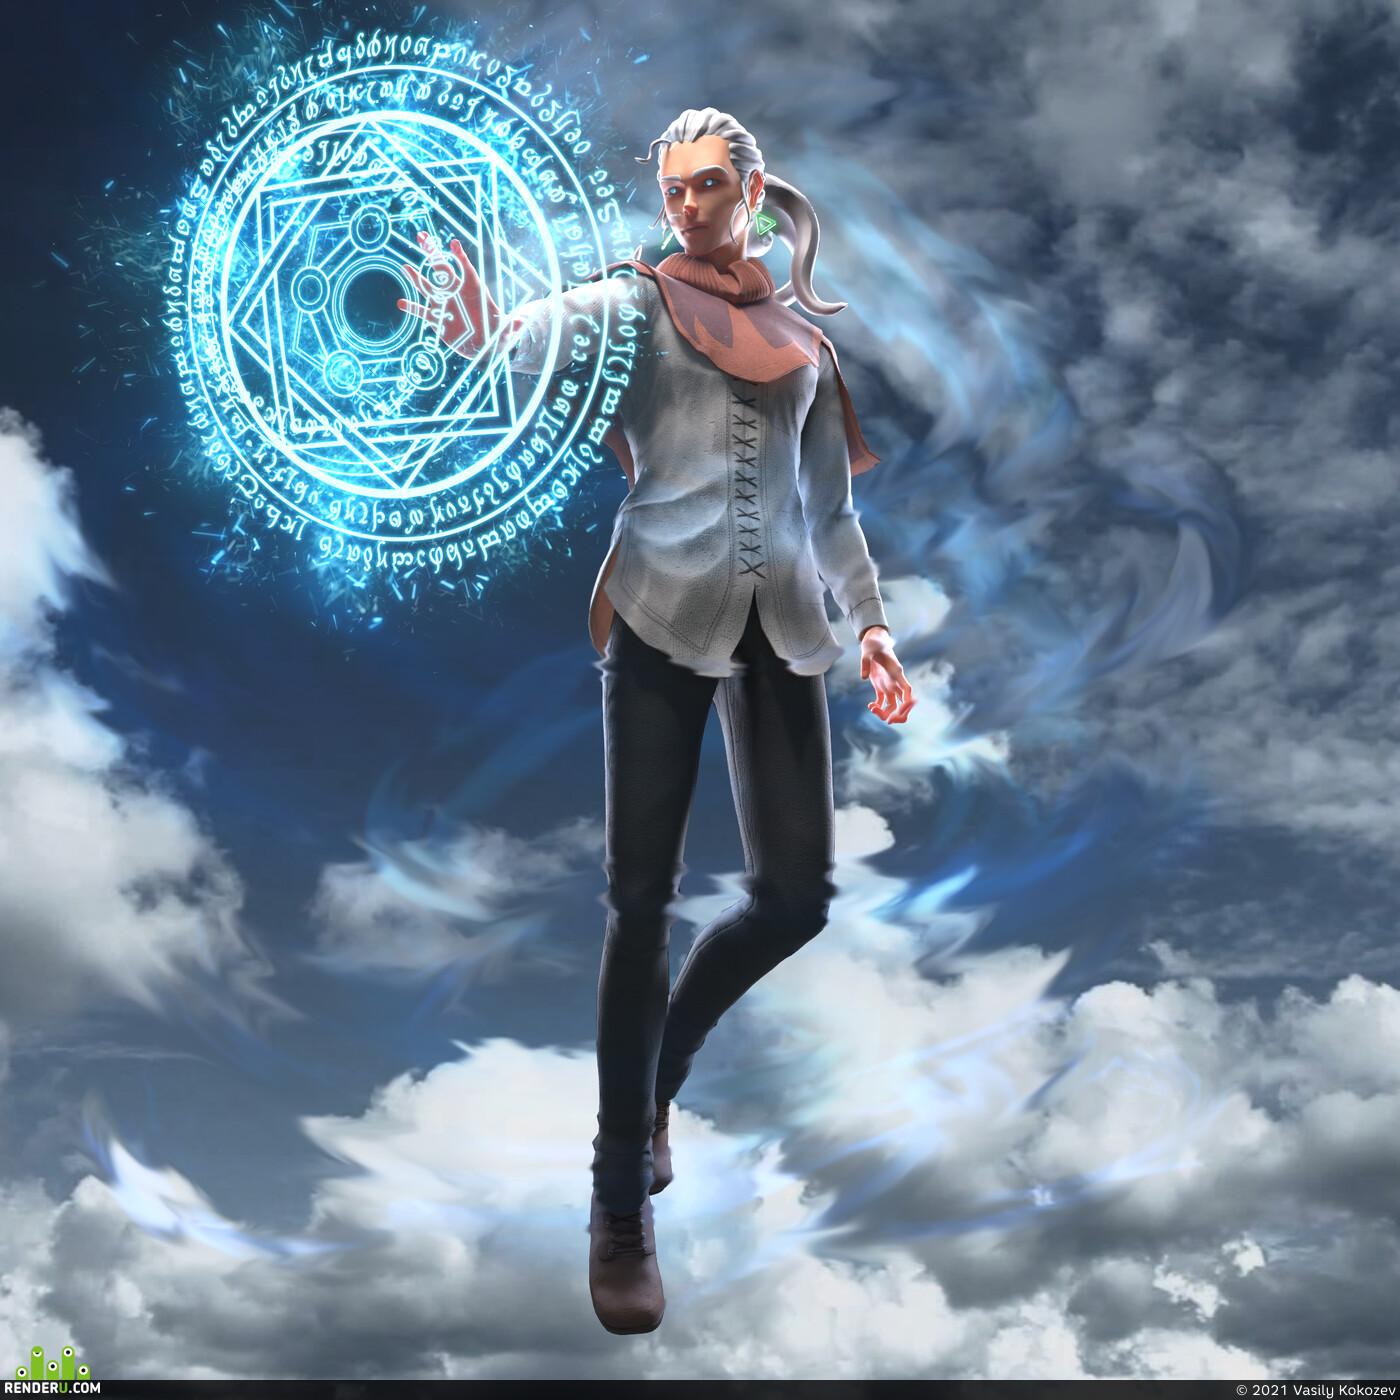 anime, magic, manga, 3d, stylize, teenager